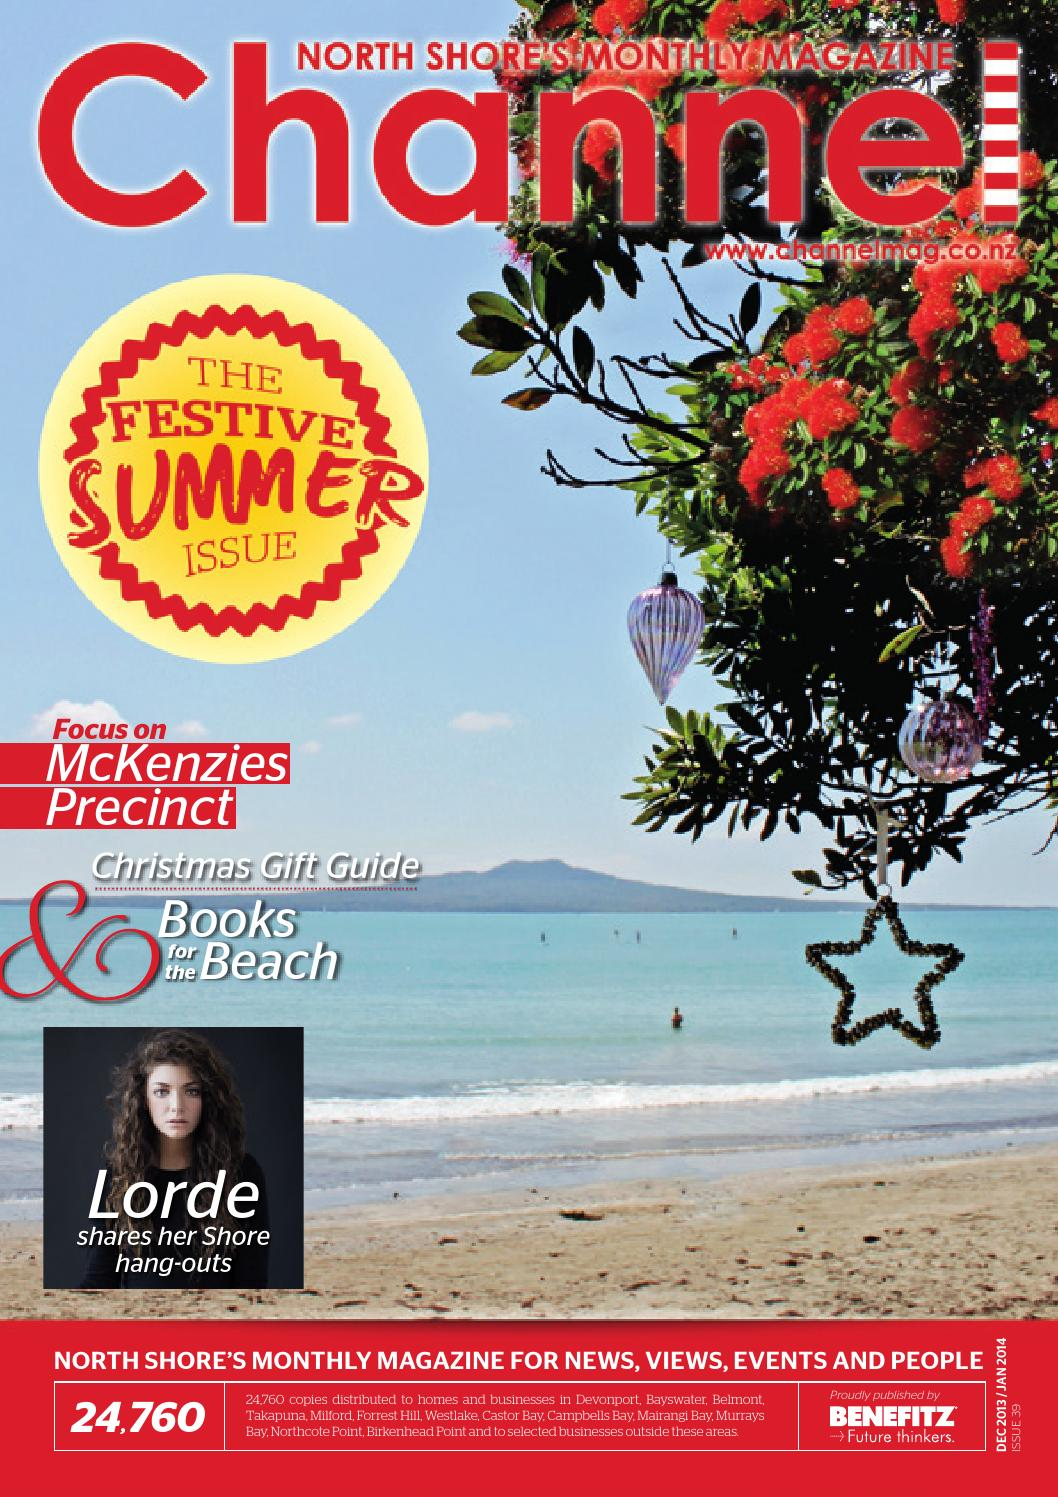 Channel Magazine December 2013 January 2014 by Benefitz - issuu